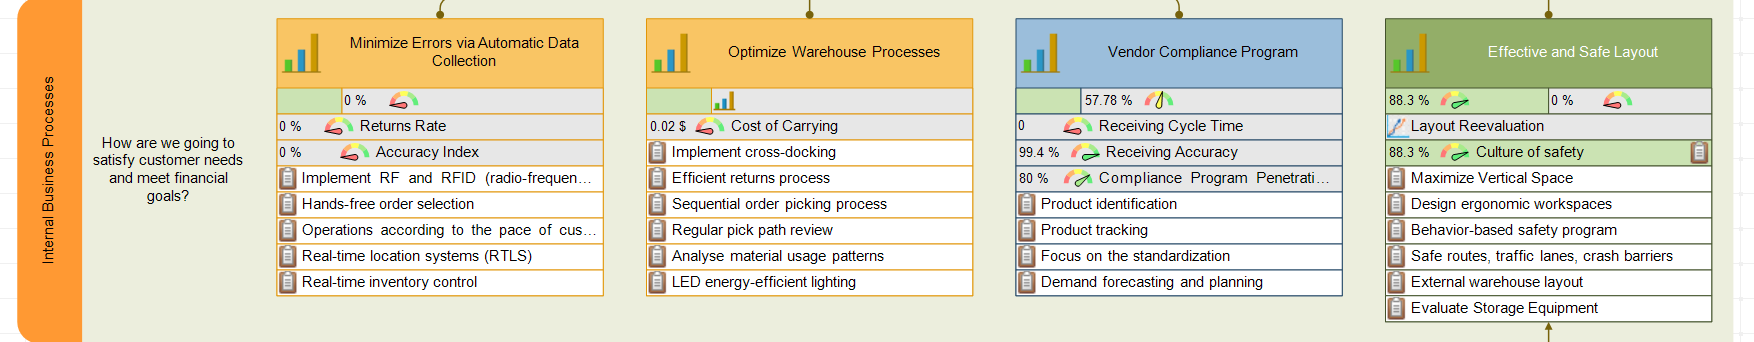 Warehouse scorecard - Internal Perspective